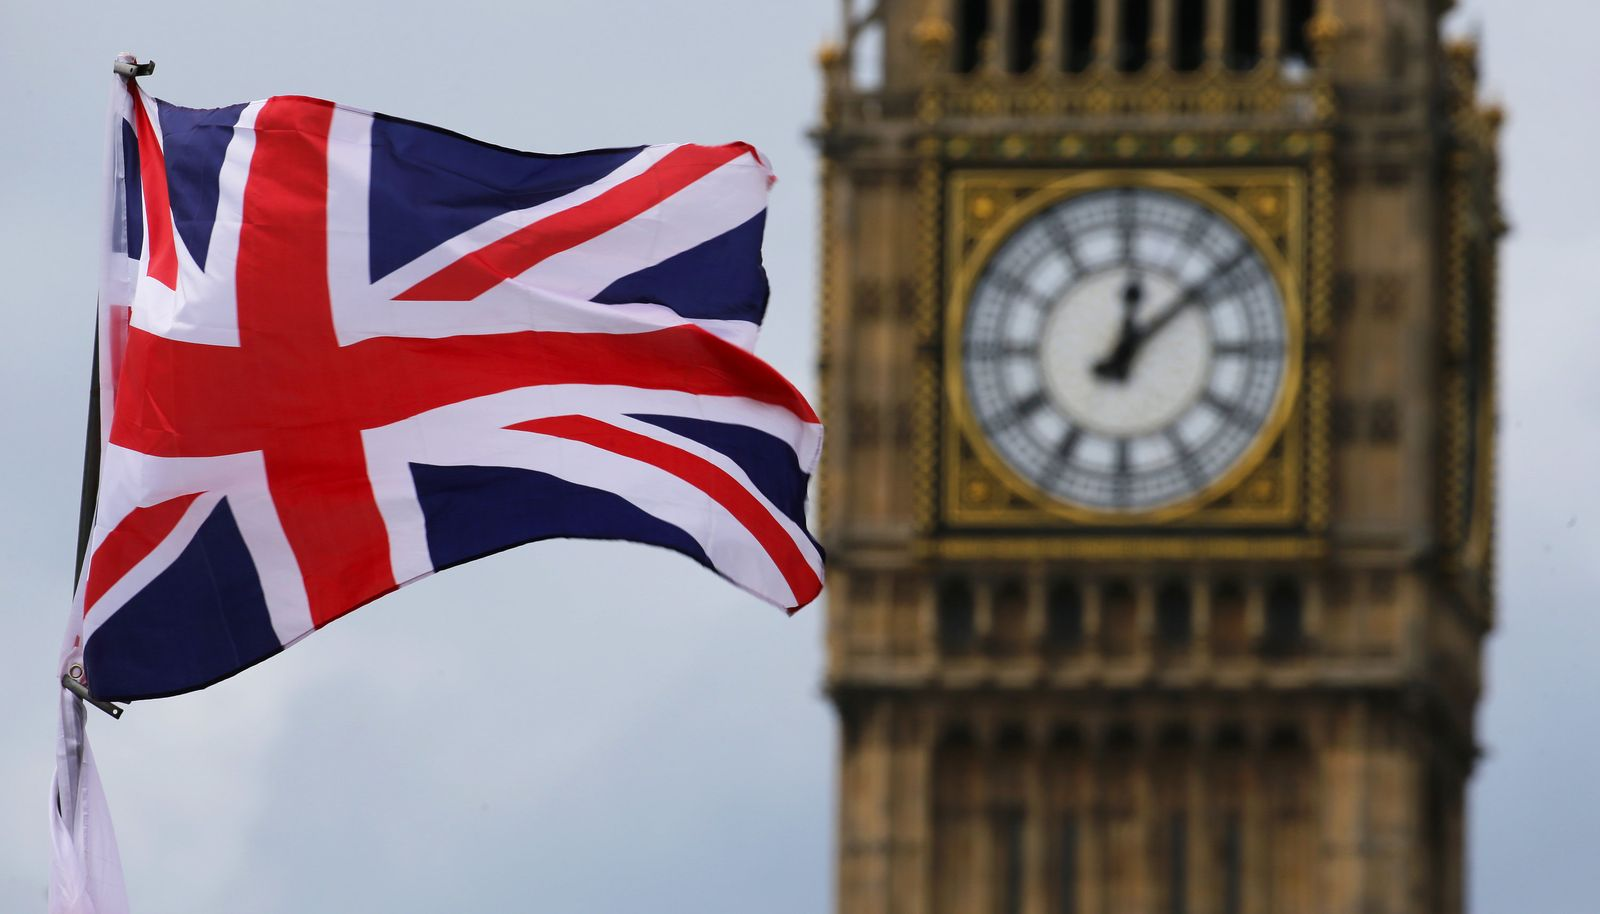 Big Ben Union Jack